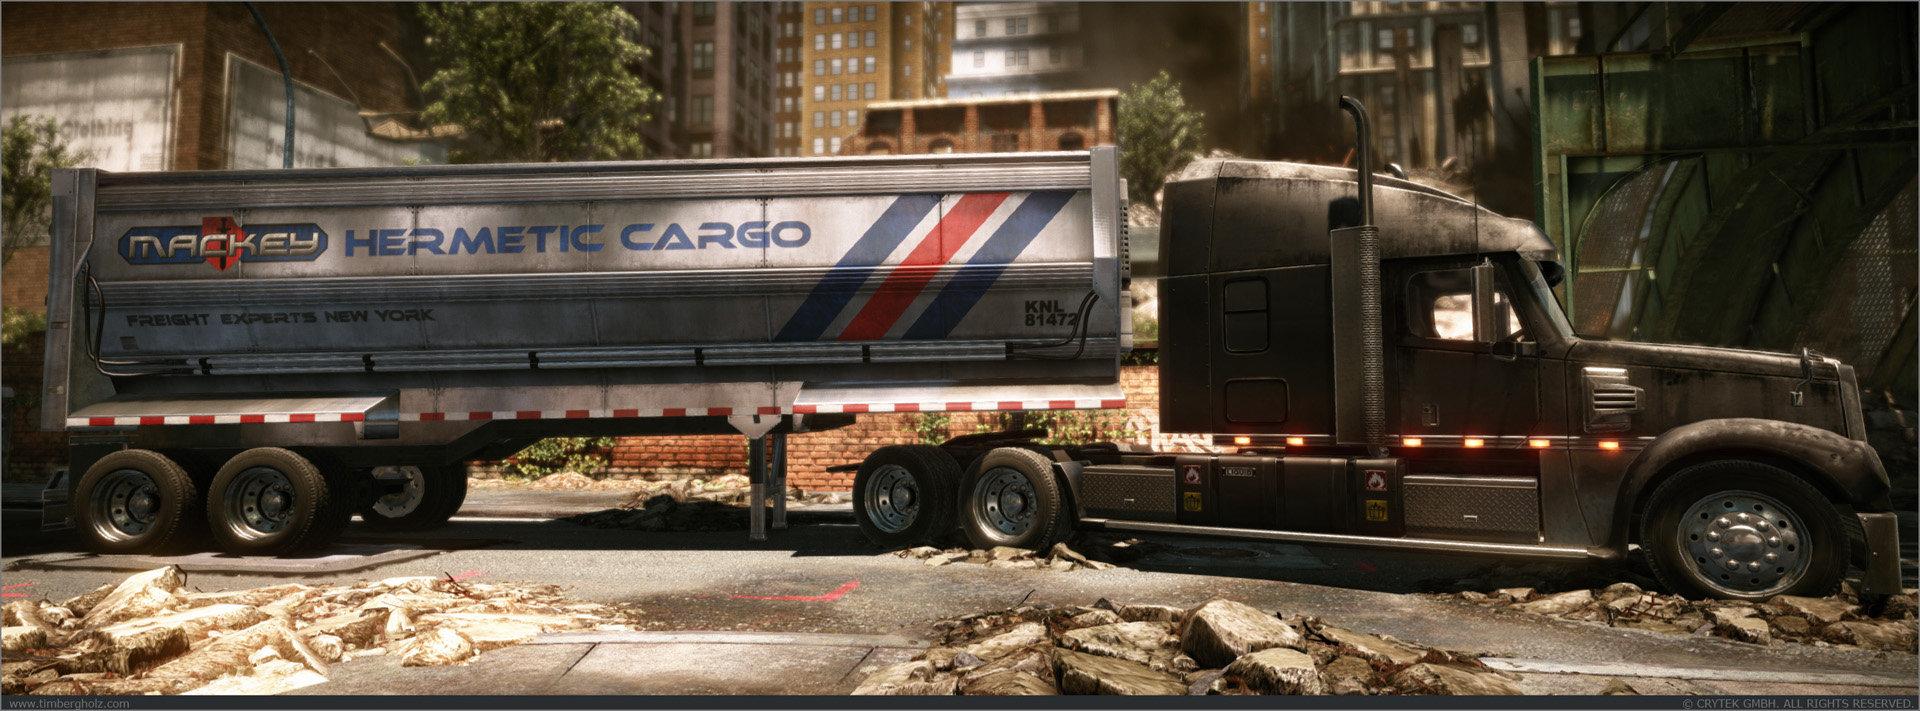 Tim bergholz truck widescreen full